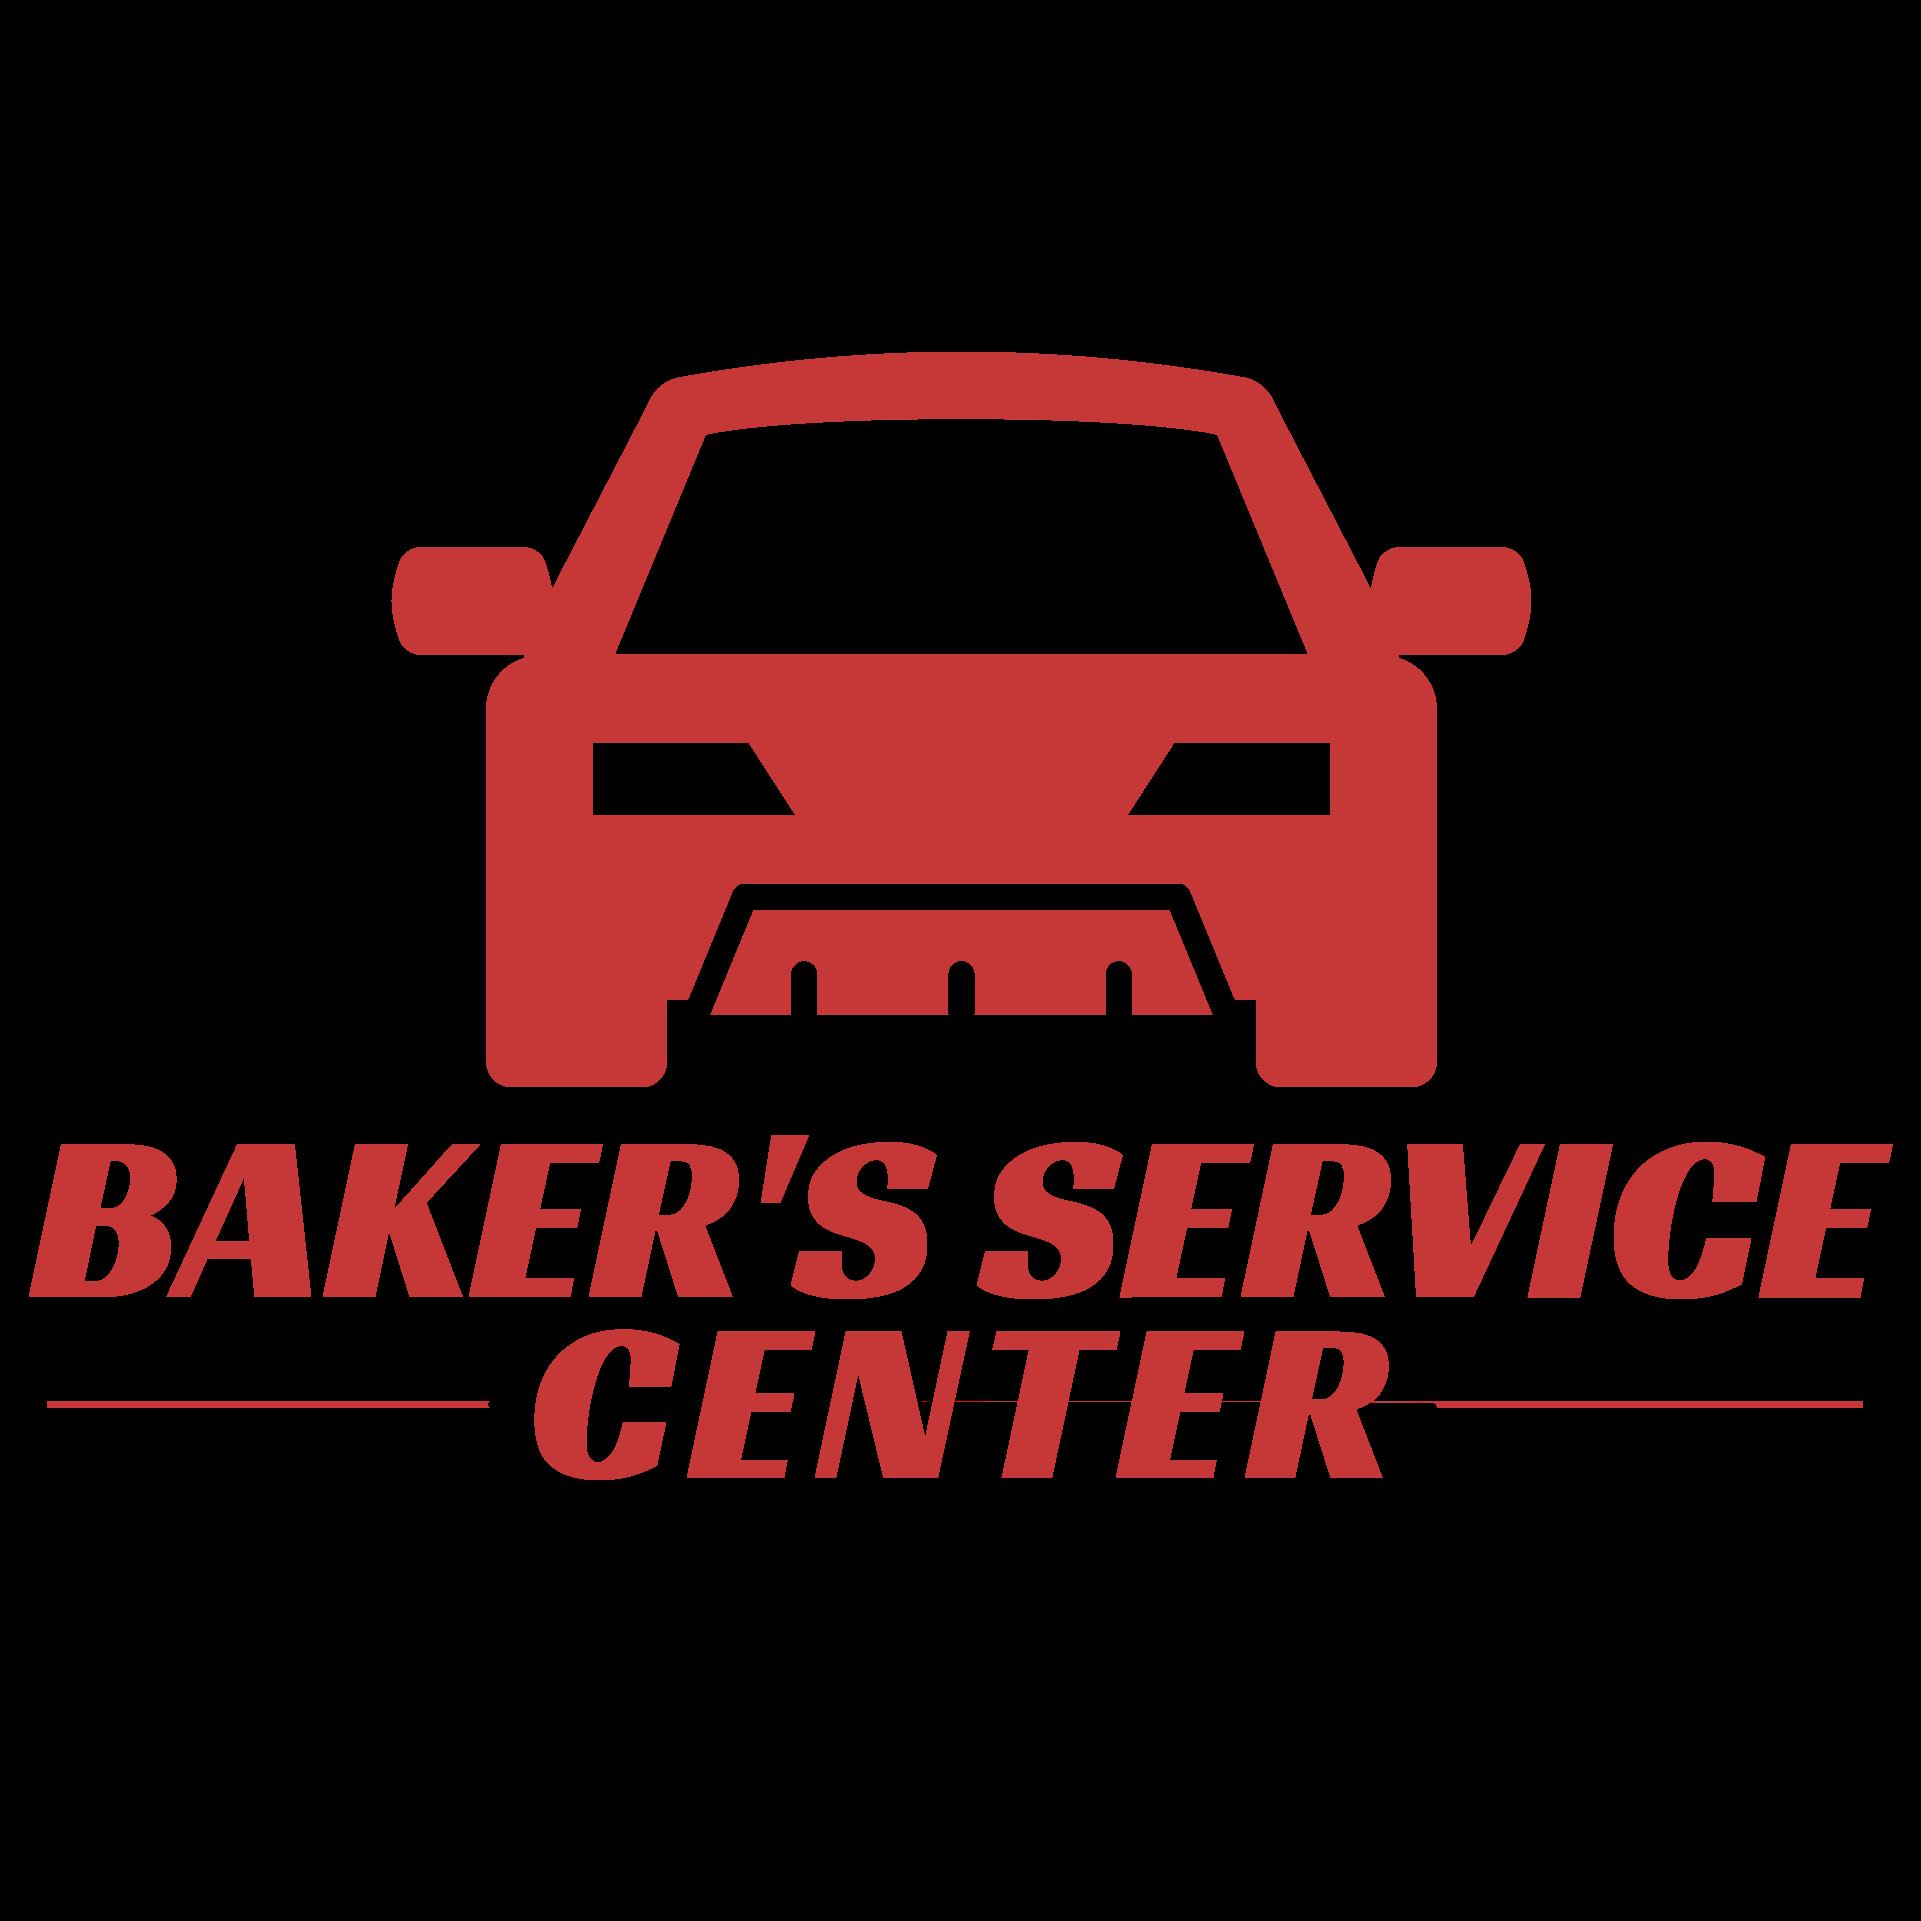 Baker's Service Center - Bangor, ME - Car Brake Repair Shops